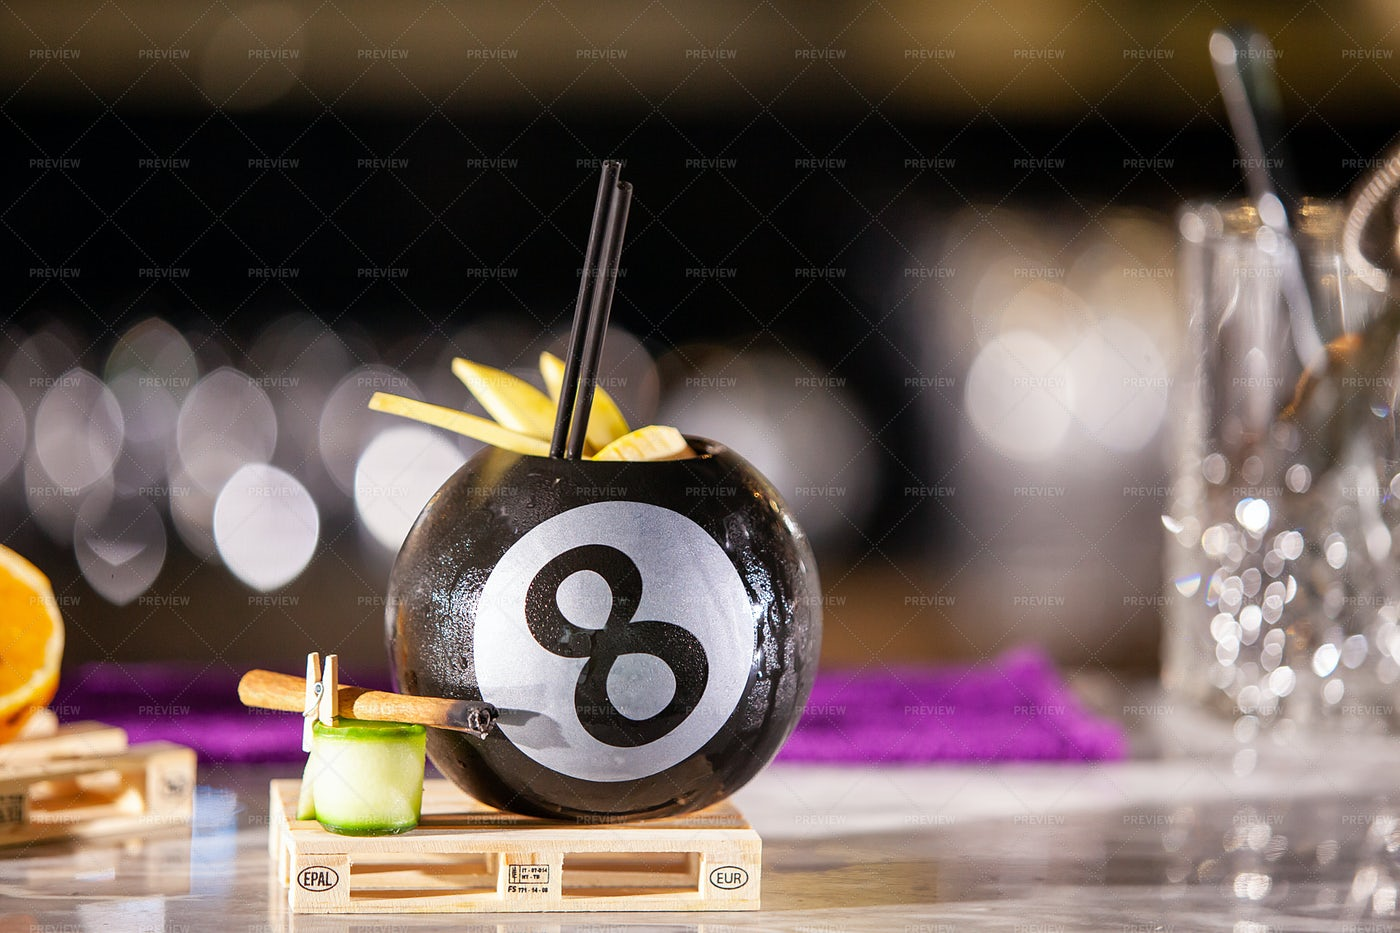 Cocktail In A Billiard Ball: Stock Photos